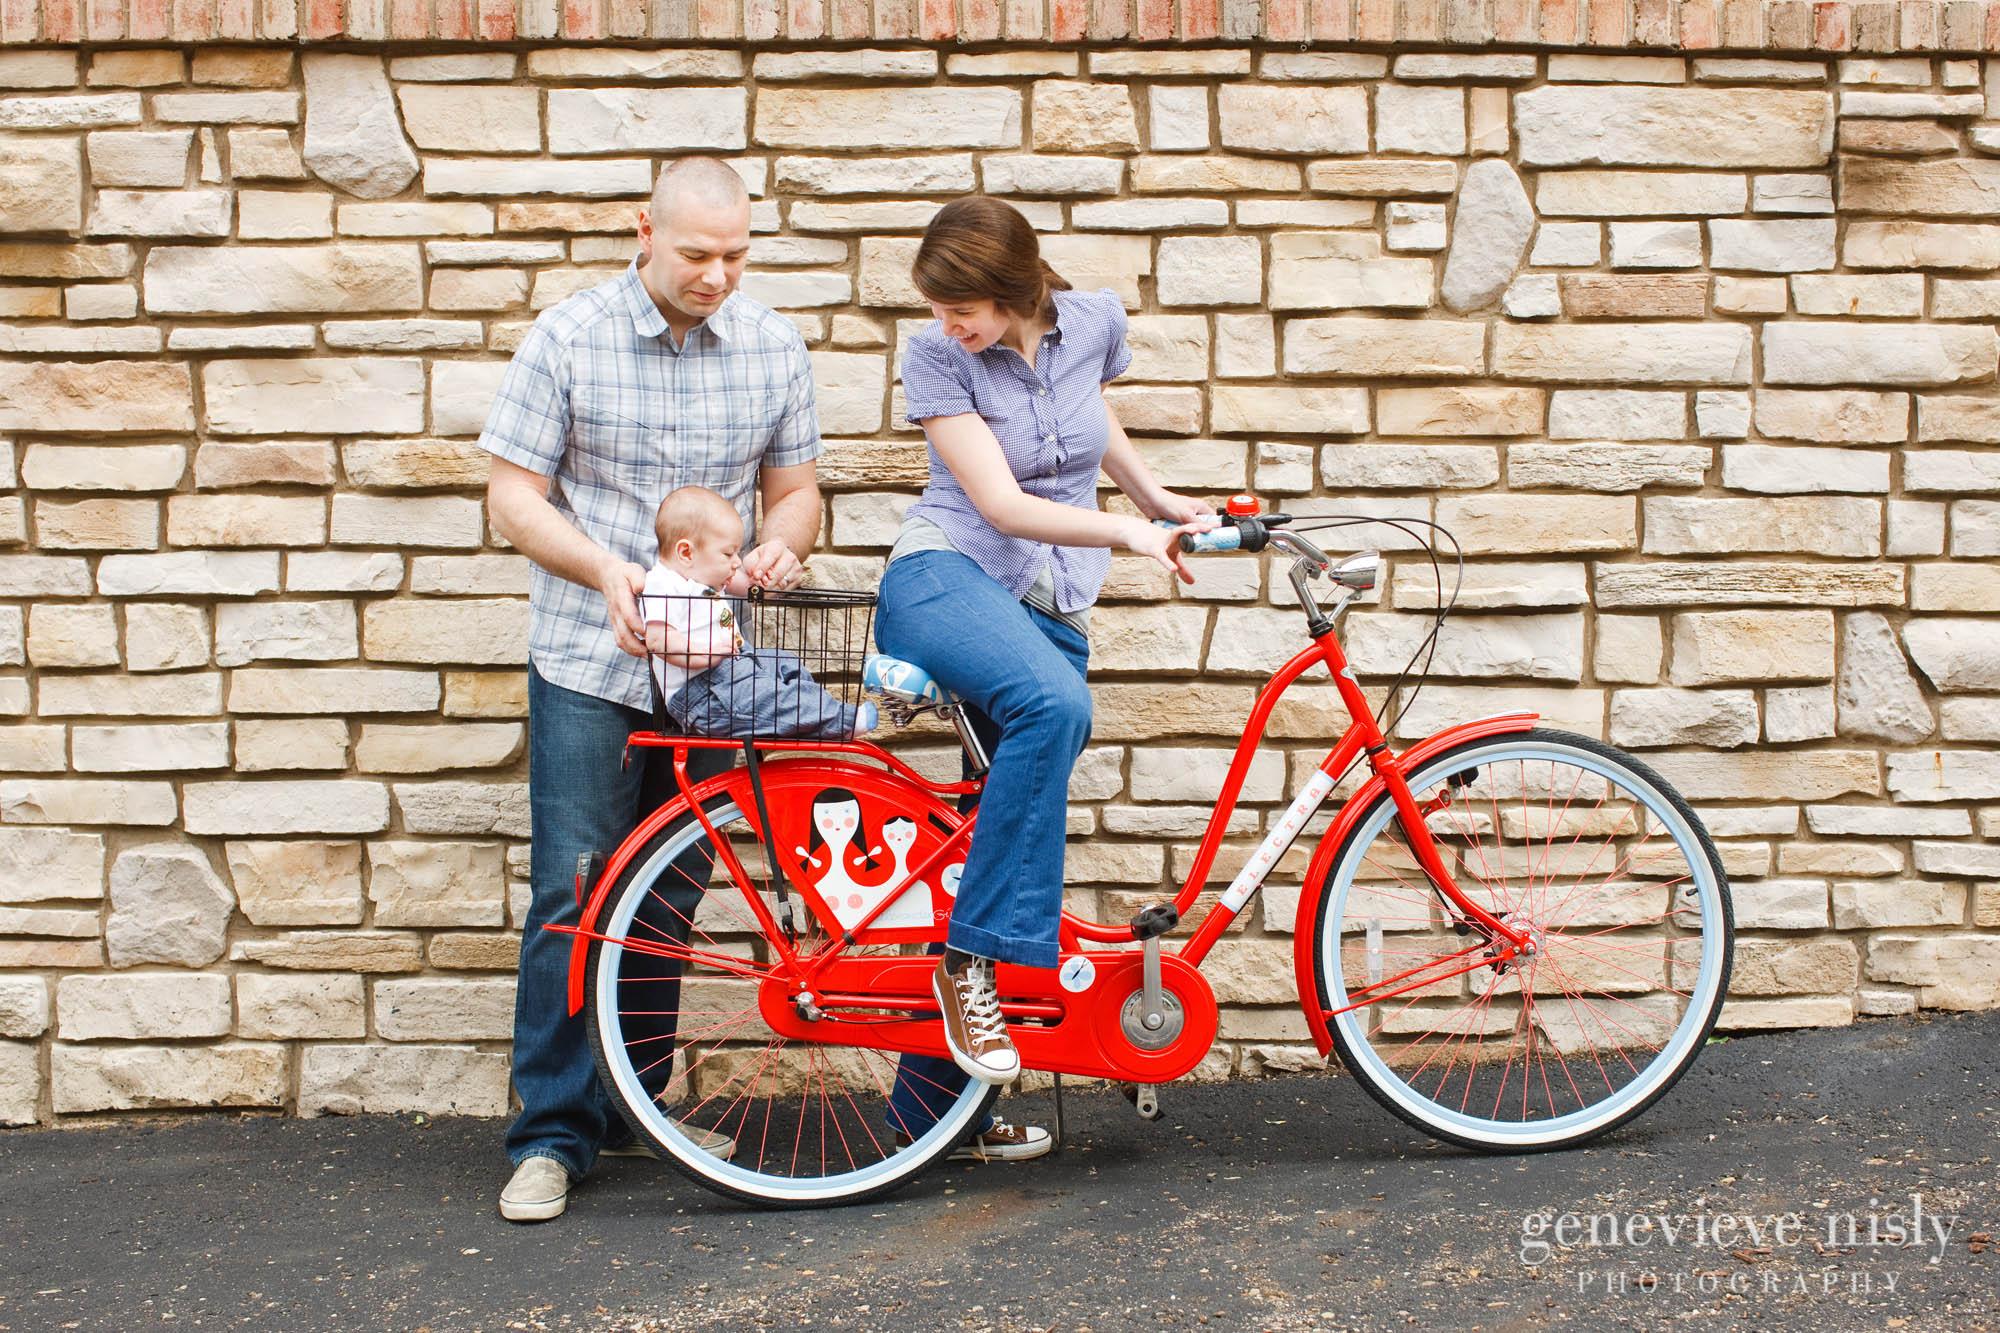 ruggles-001-akron-ohio-portrait-photographer-genevieve-nisly-photography